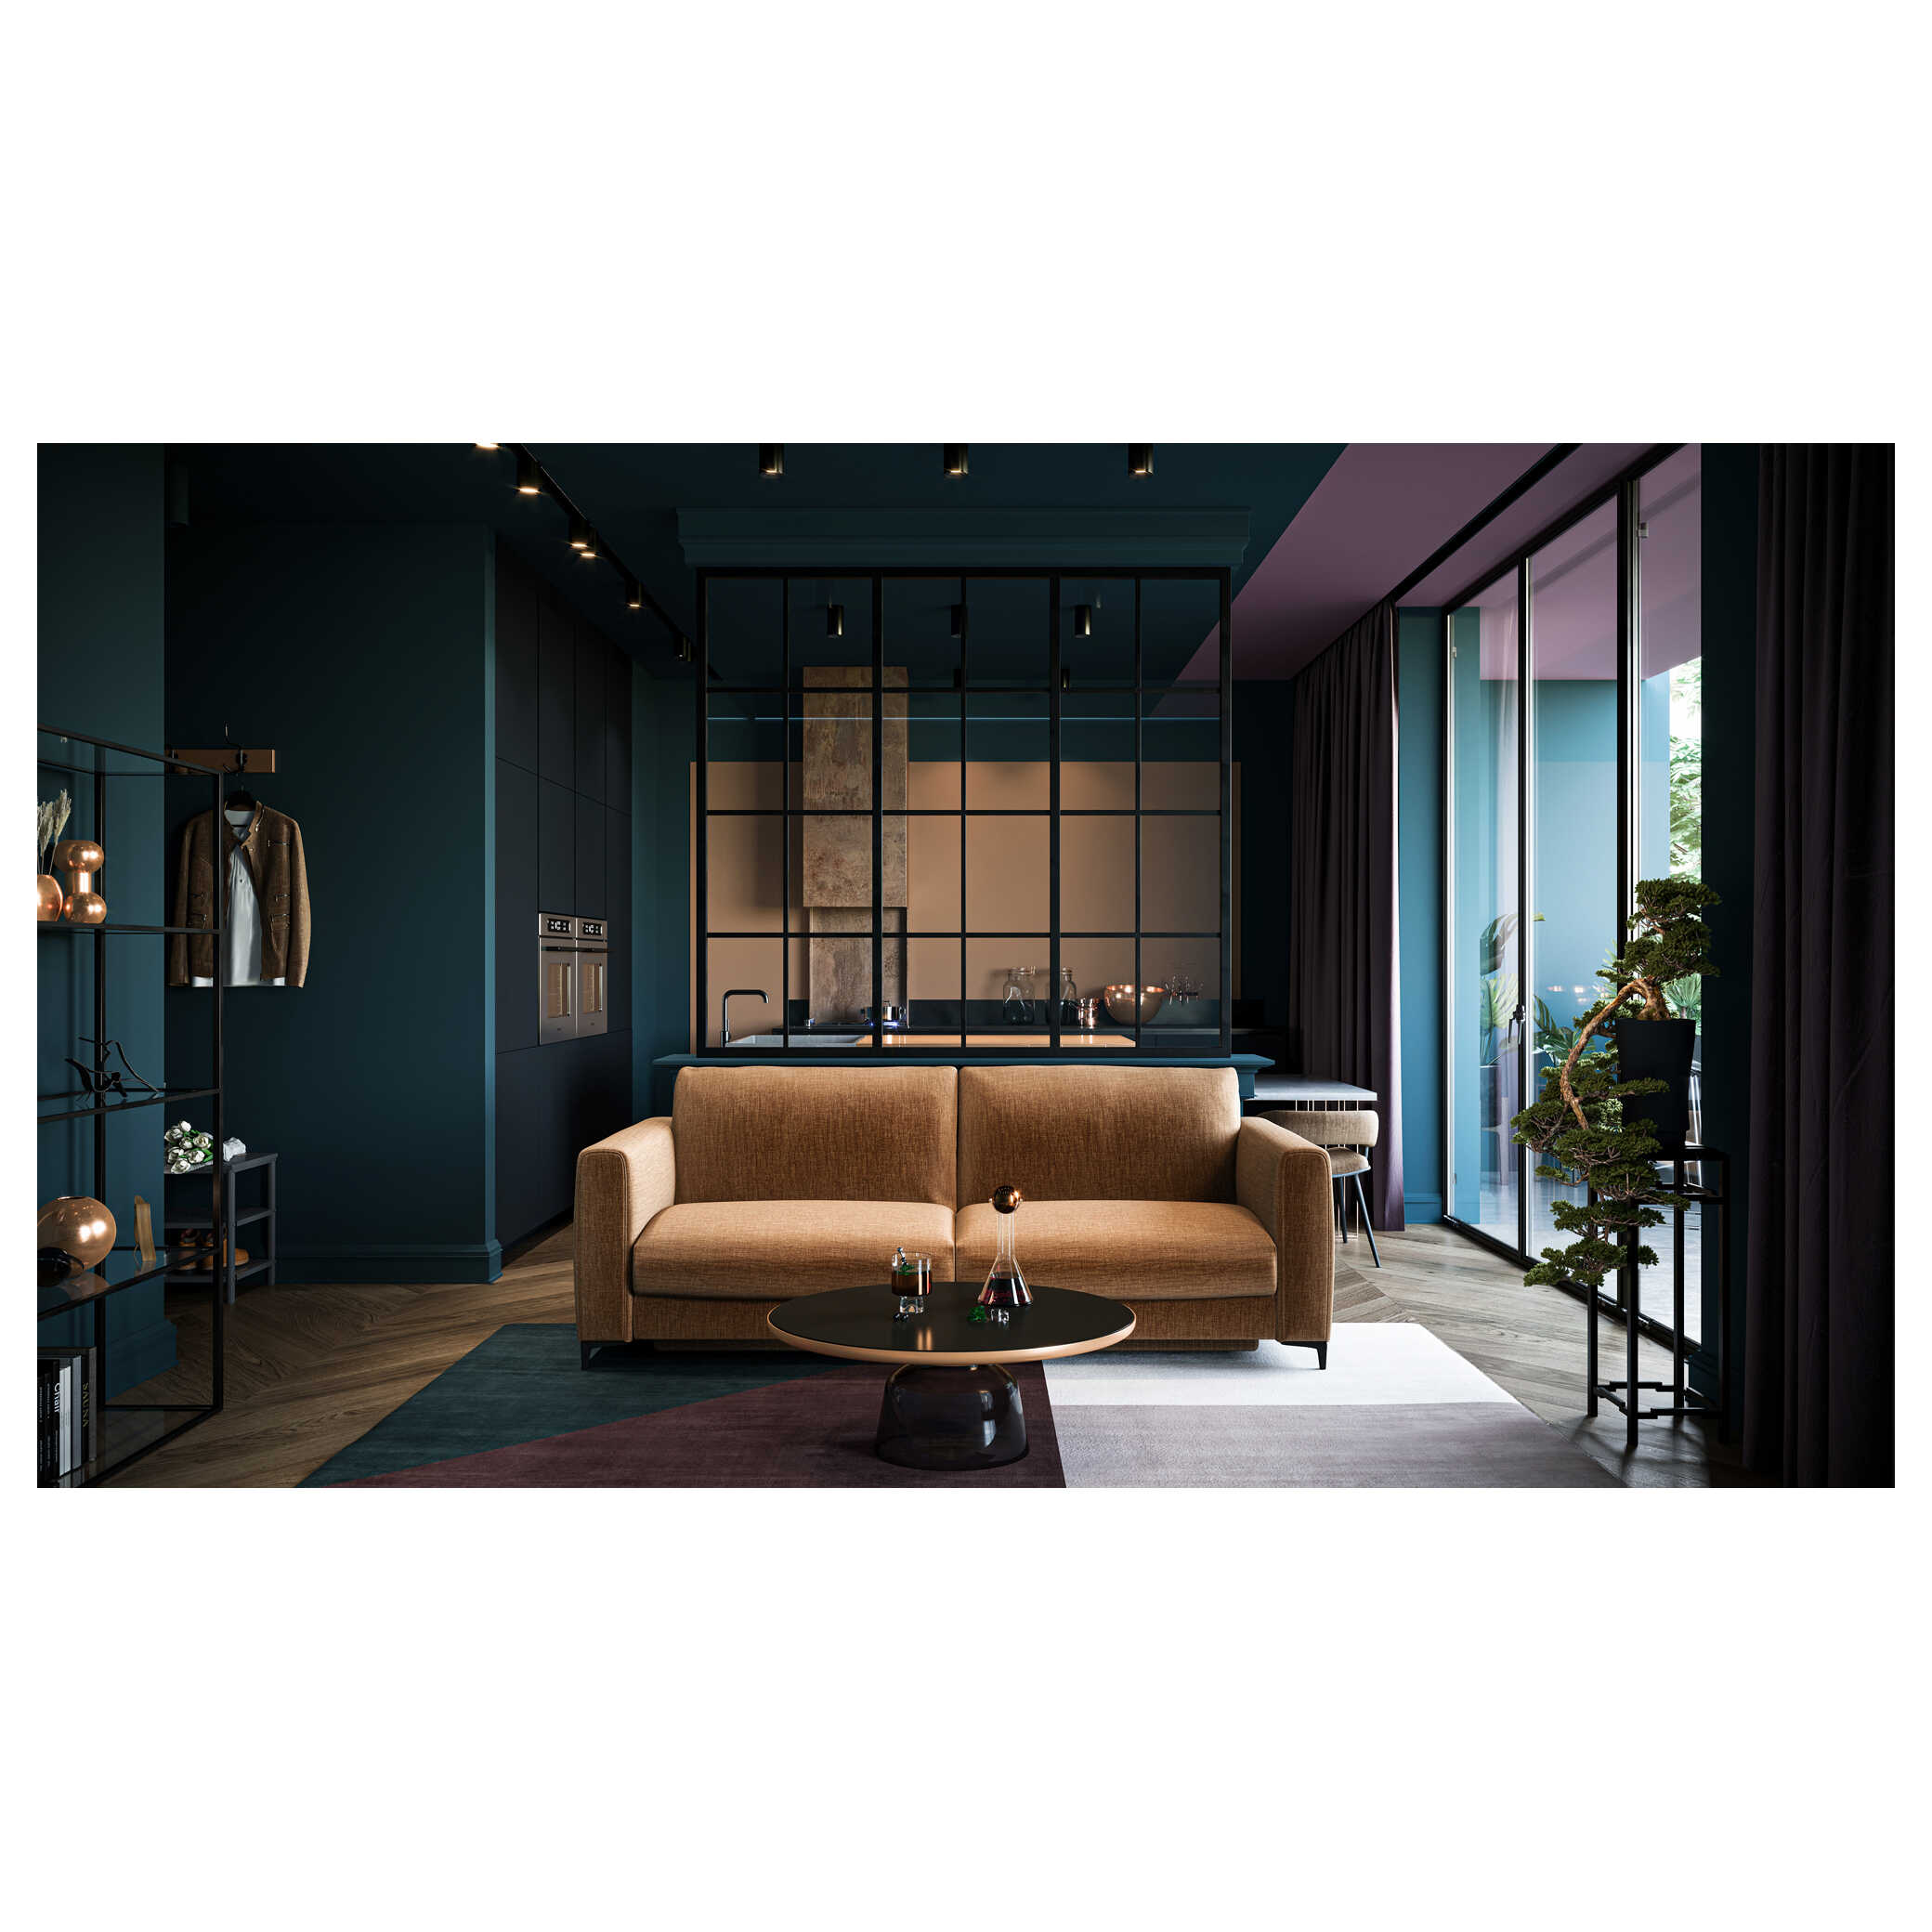 MOON Sofa 3 osobowa – Boki S  loading='lazy'